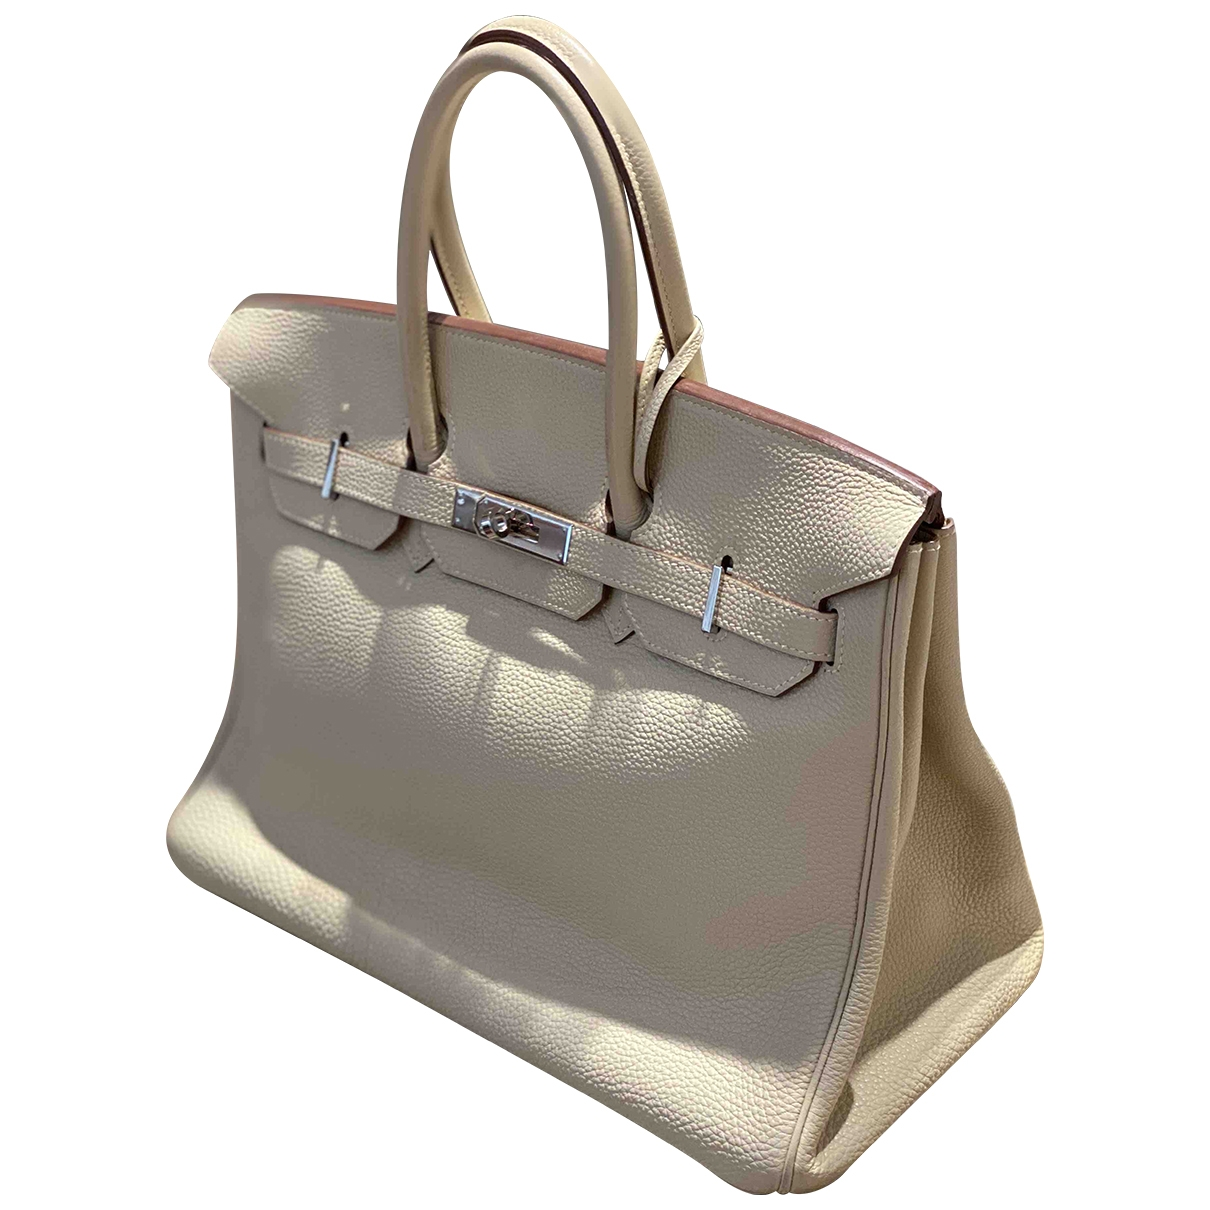 Hermes Birkin 35 Handtasche in  Weiss Leder